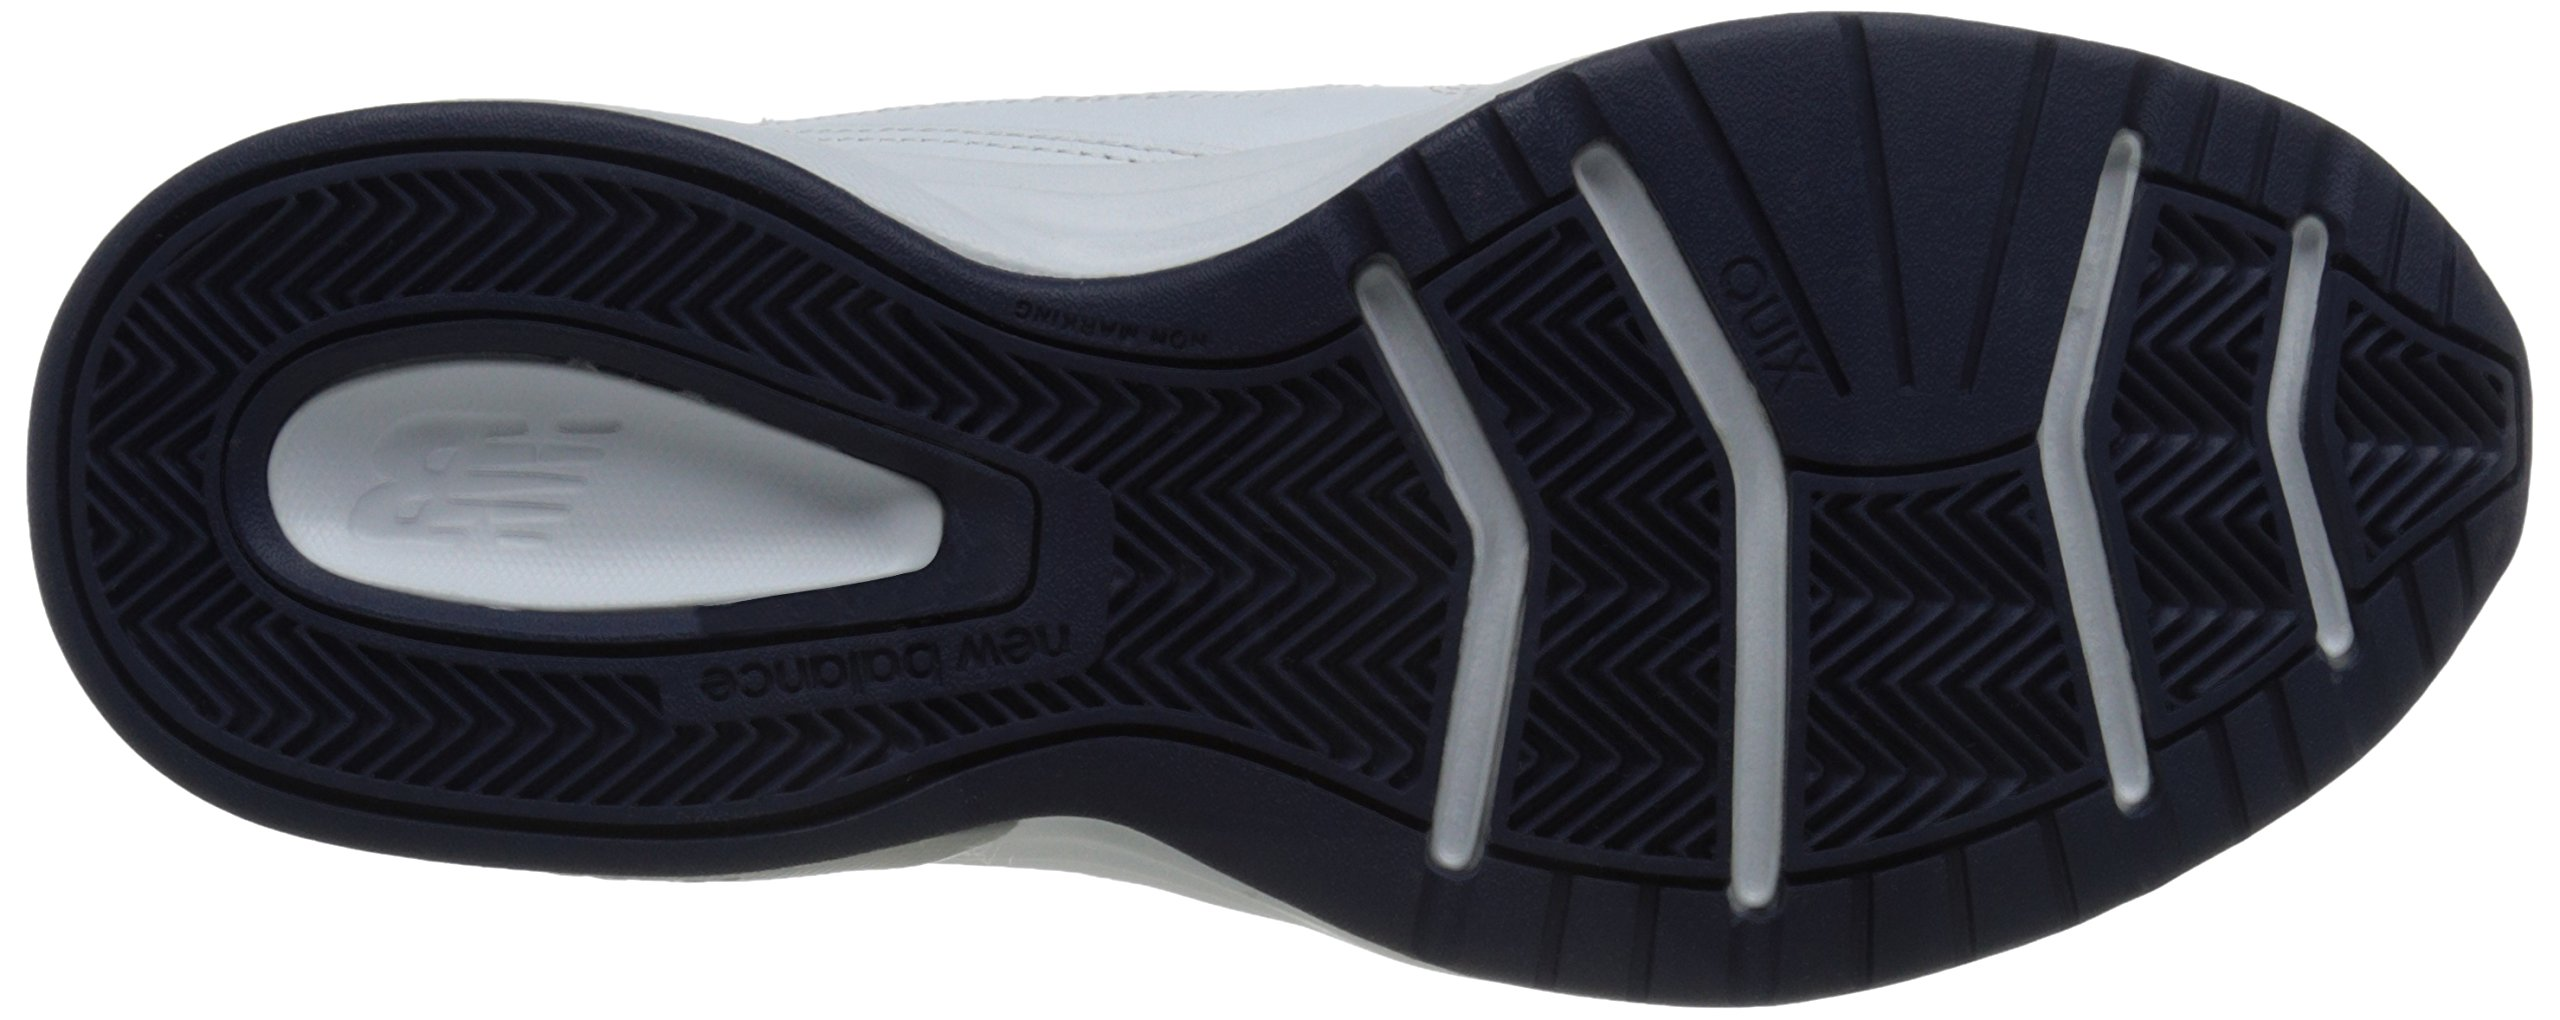 New Balance Men's MX623v3 Casual Comfort Training Shoe,  White/Navy, 8 M US by New Balance (Image #3)